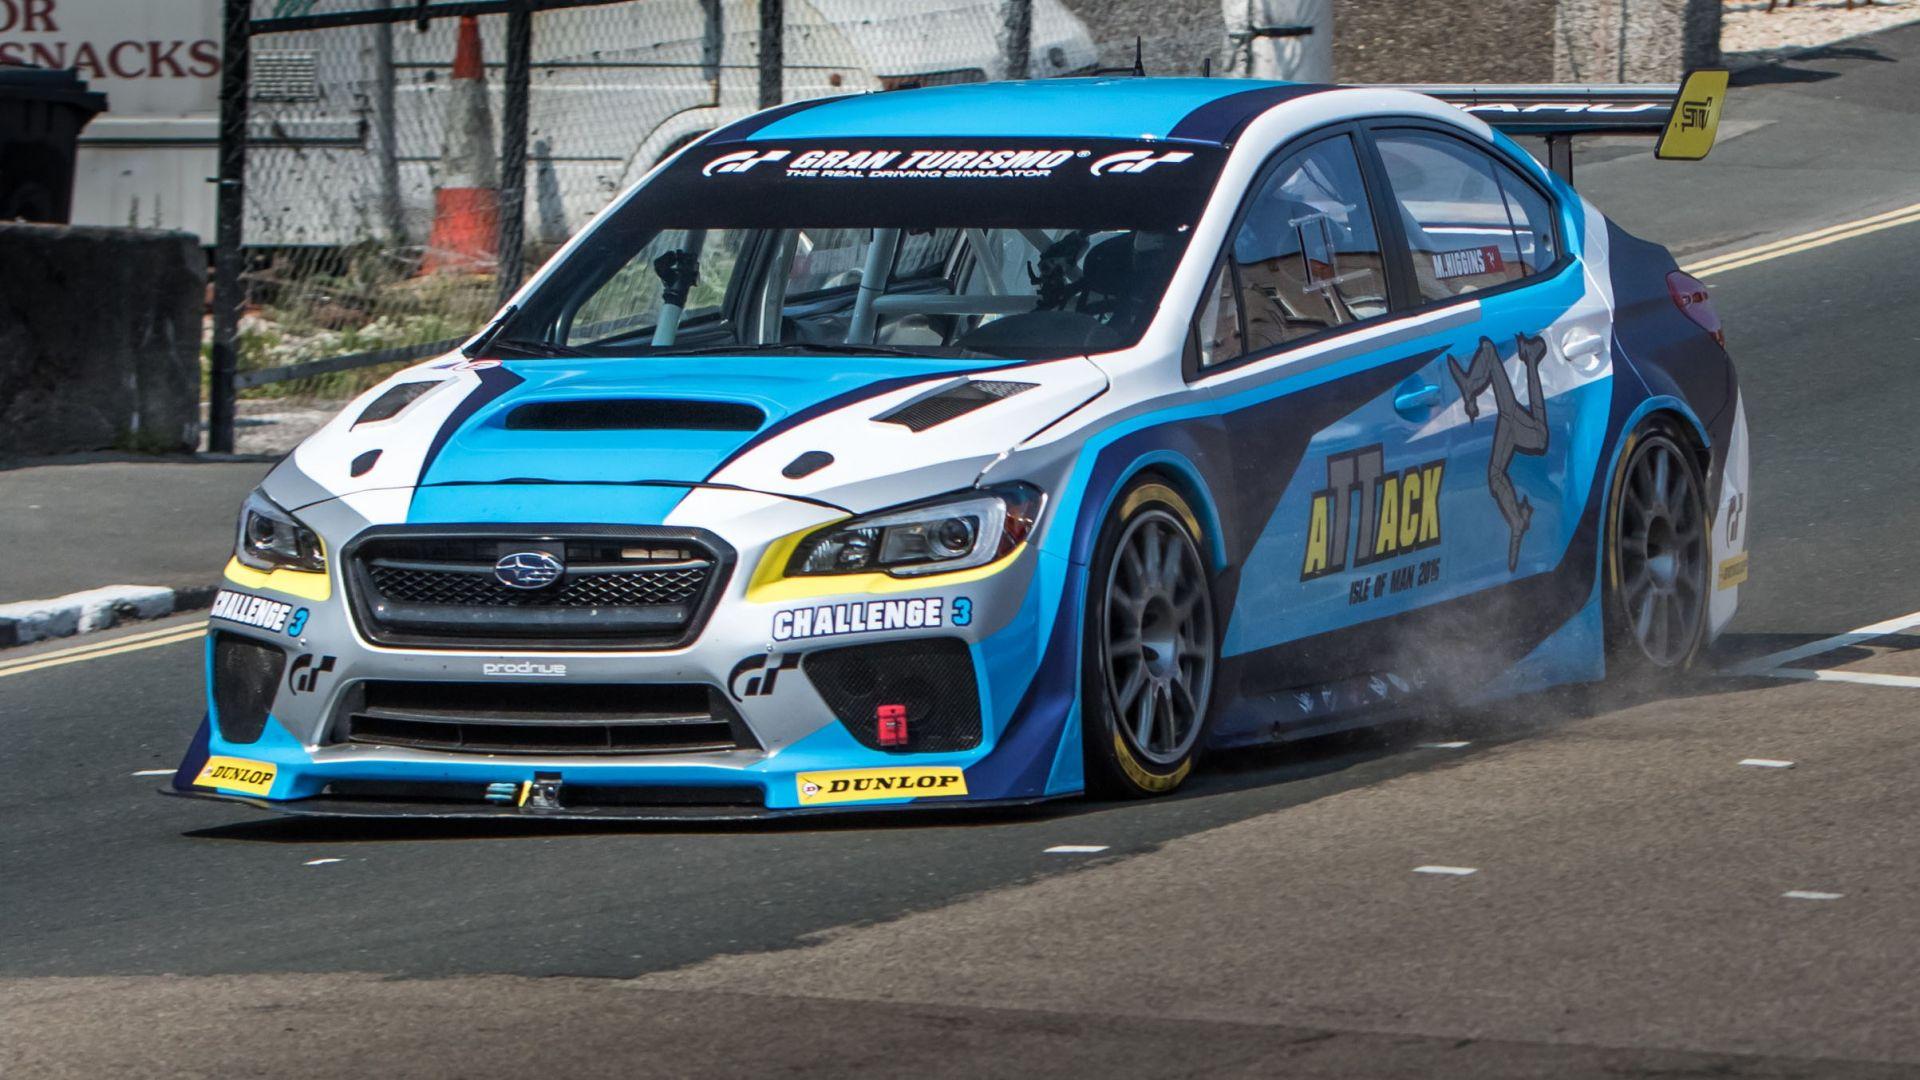 Orig in addition X Lg besides Subaru Brz Sti Performance Concept Nyc Auto Show Autonation Drive besides Hqdefault furthermore Maxresdefault. on subaru brz sti 2016